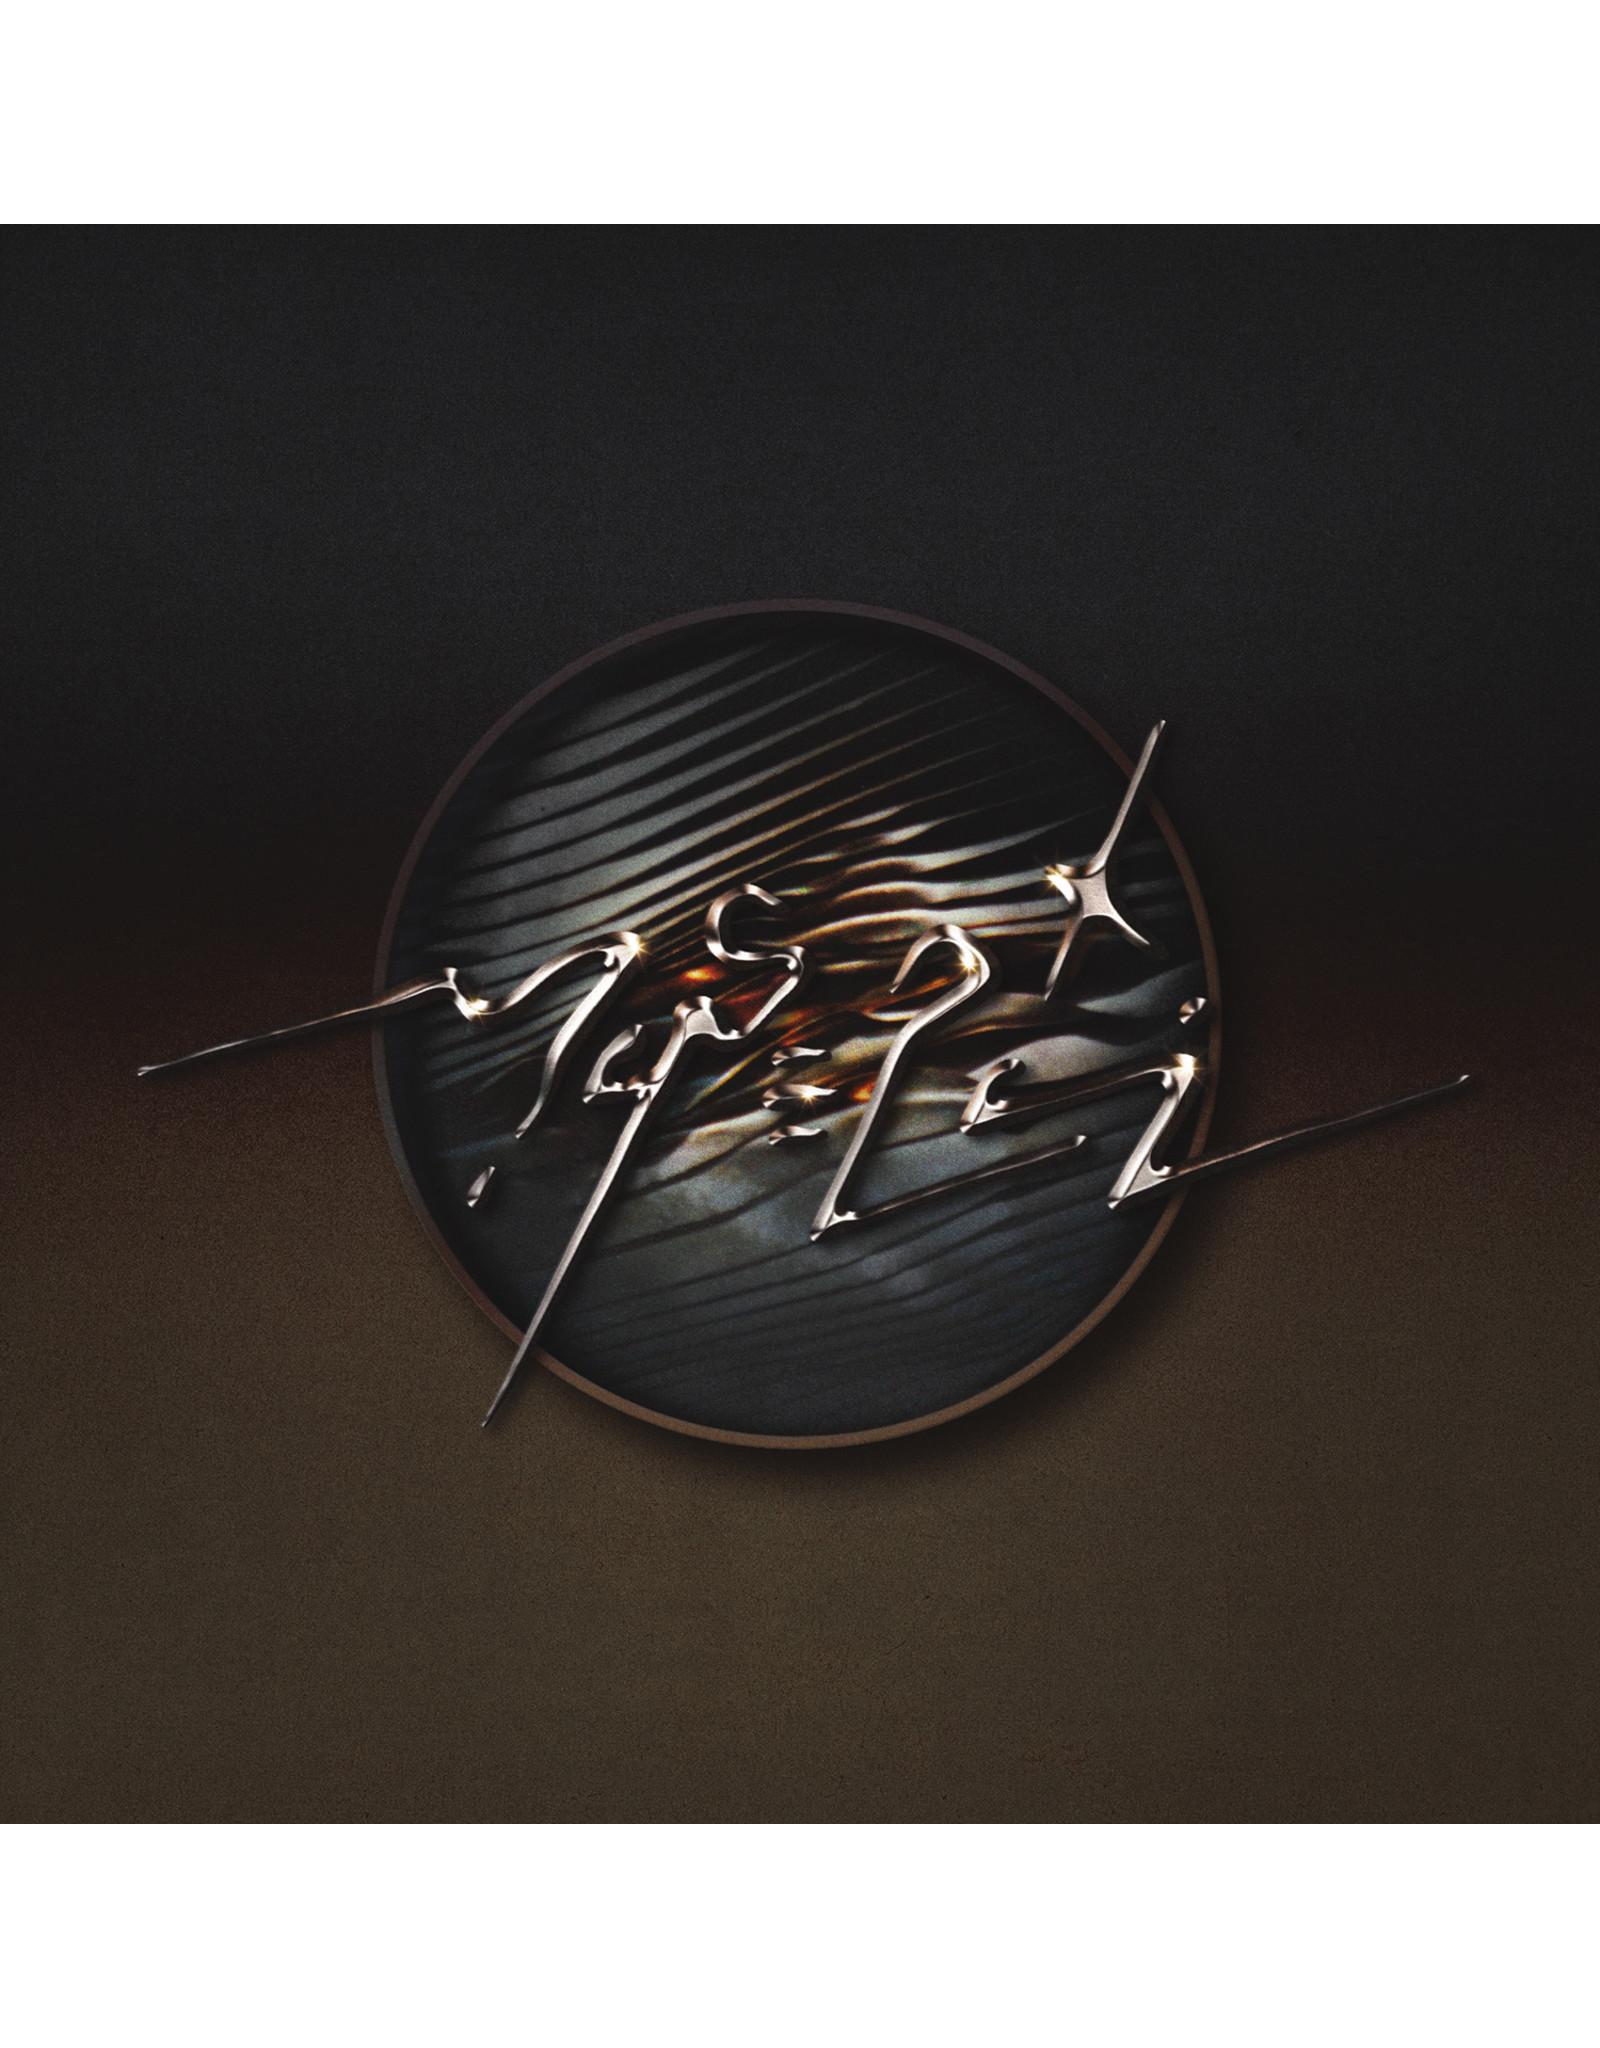 New Vinyl Maserati - Enter The Mirror LP